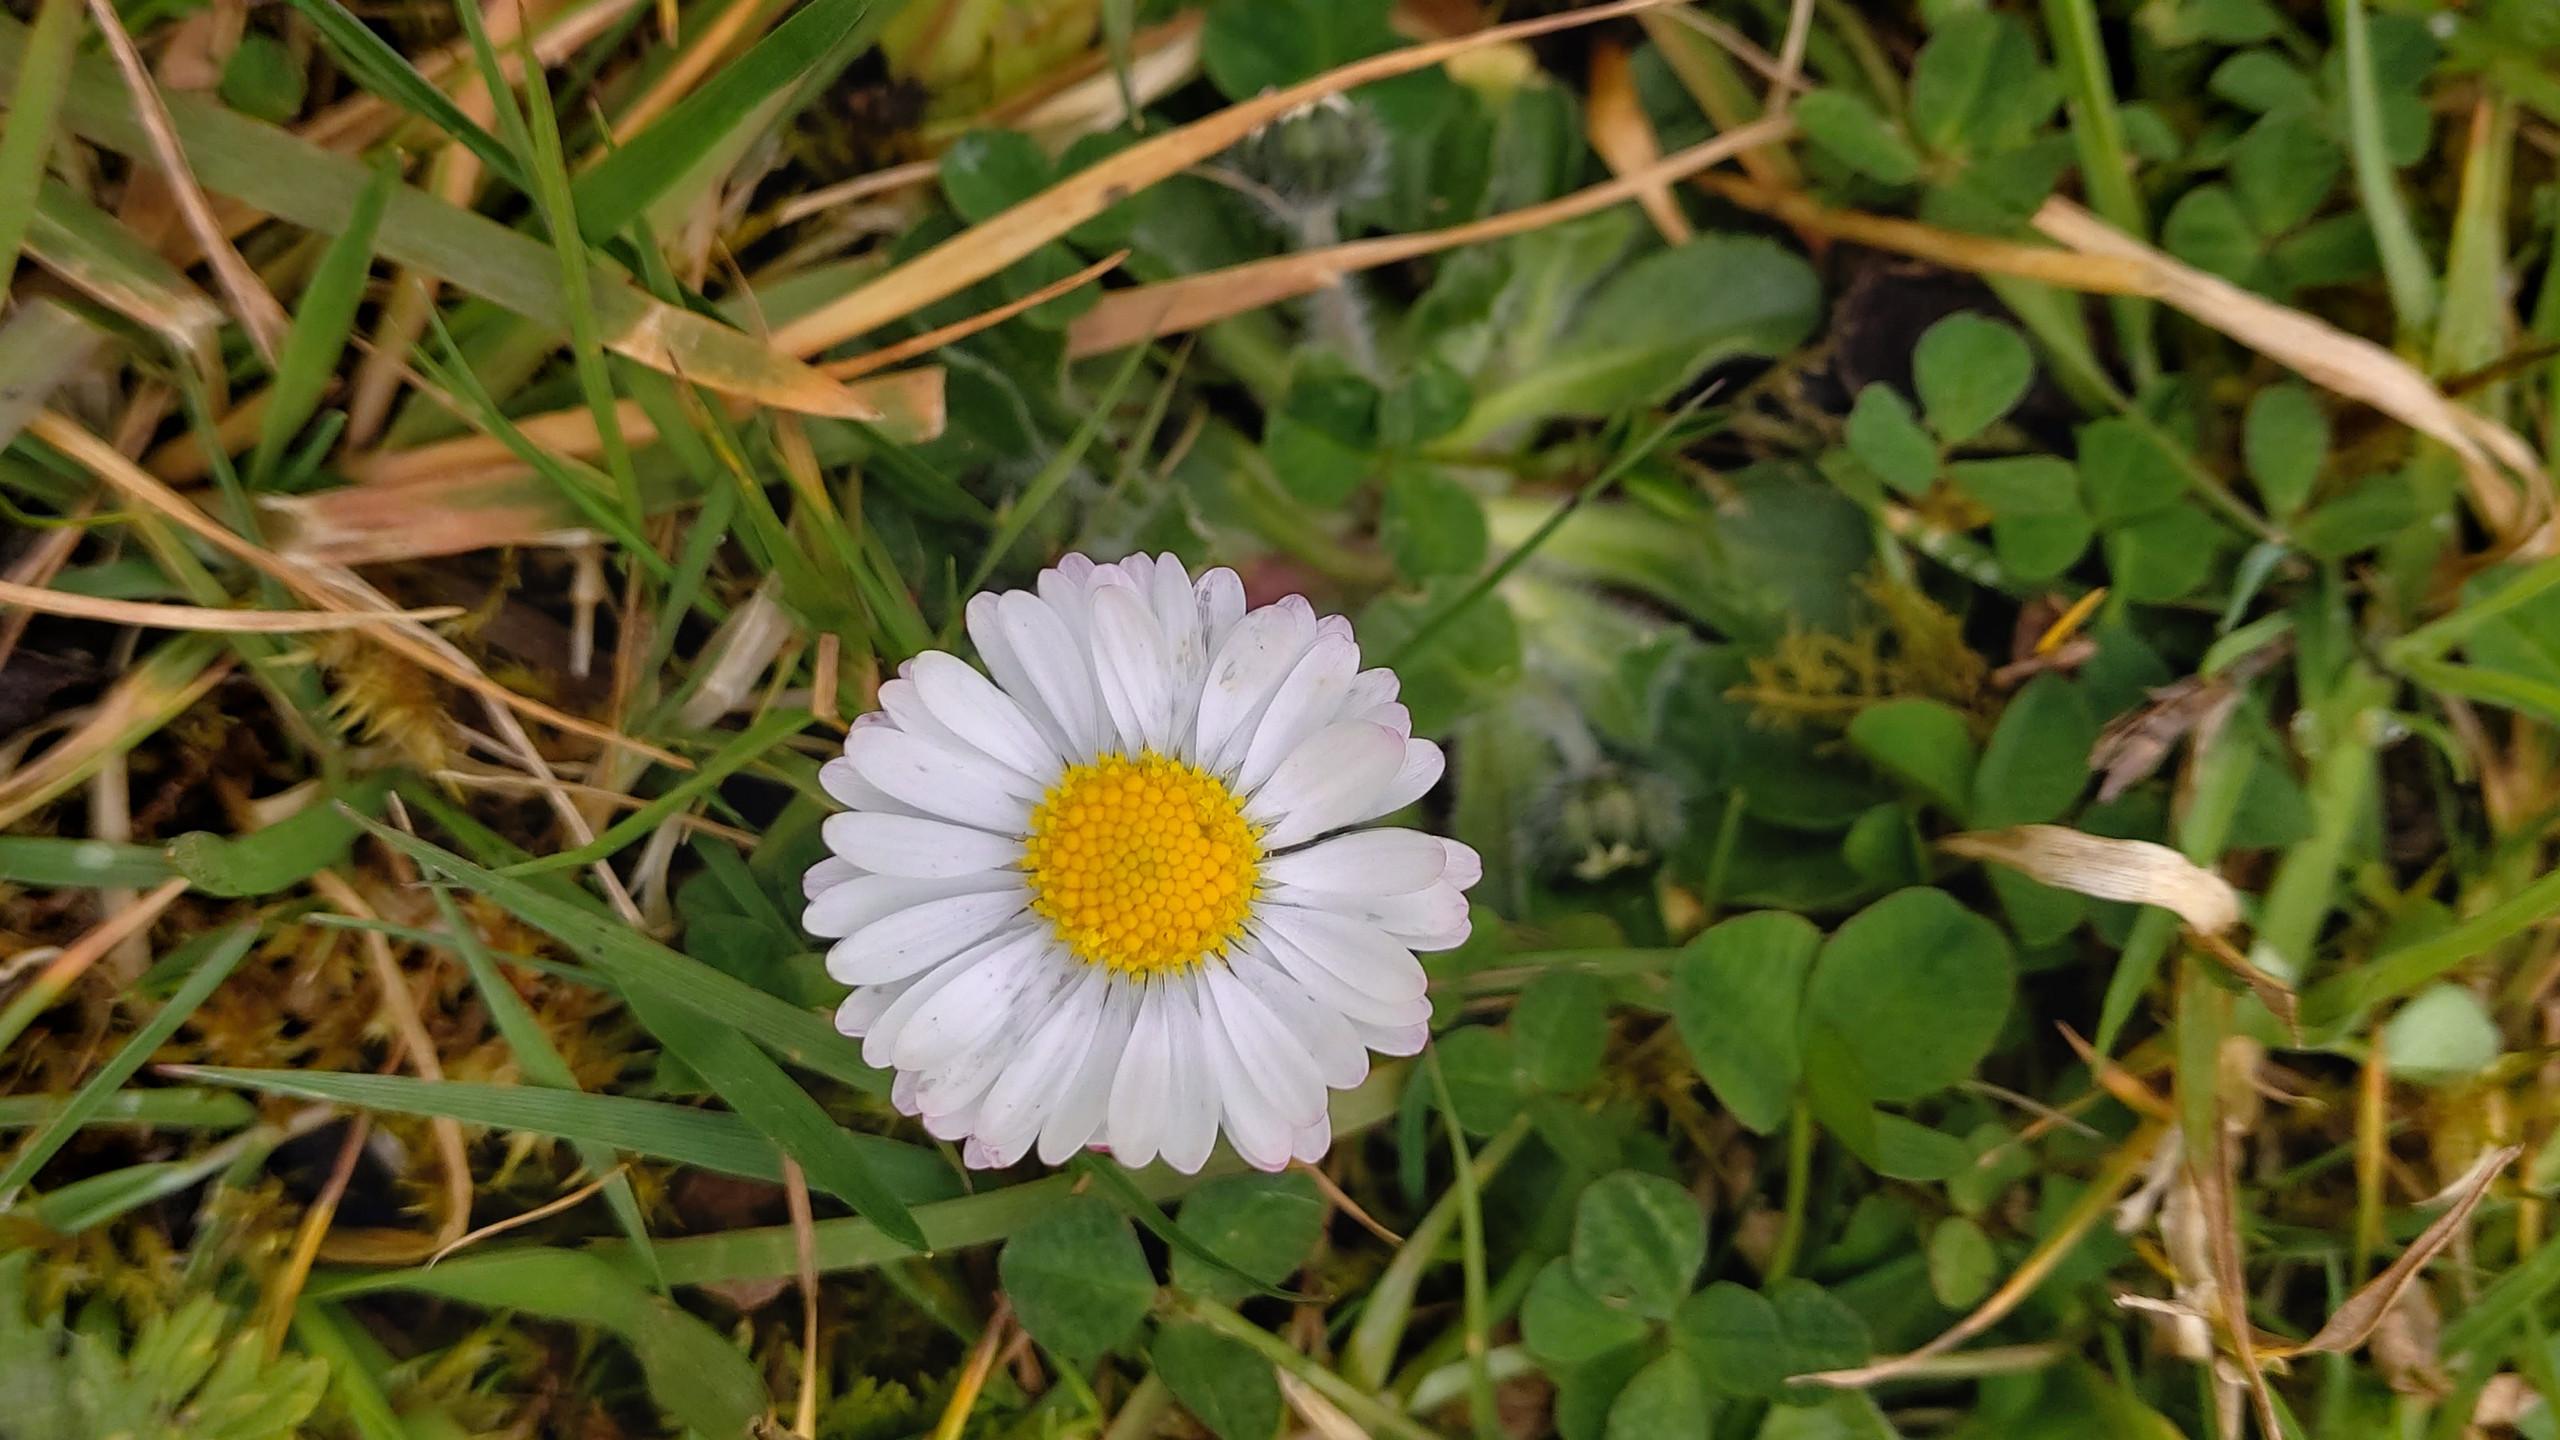 delightful daisy